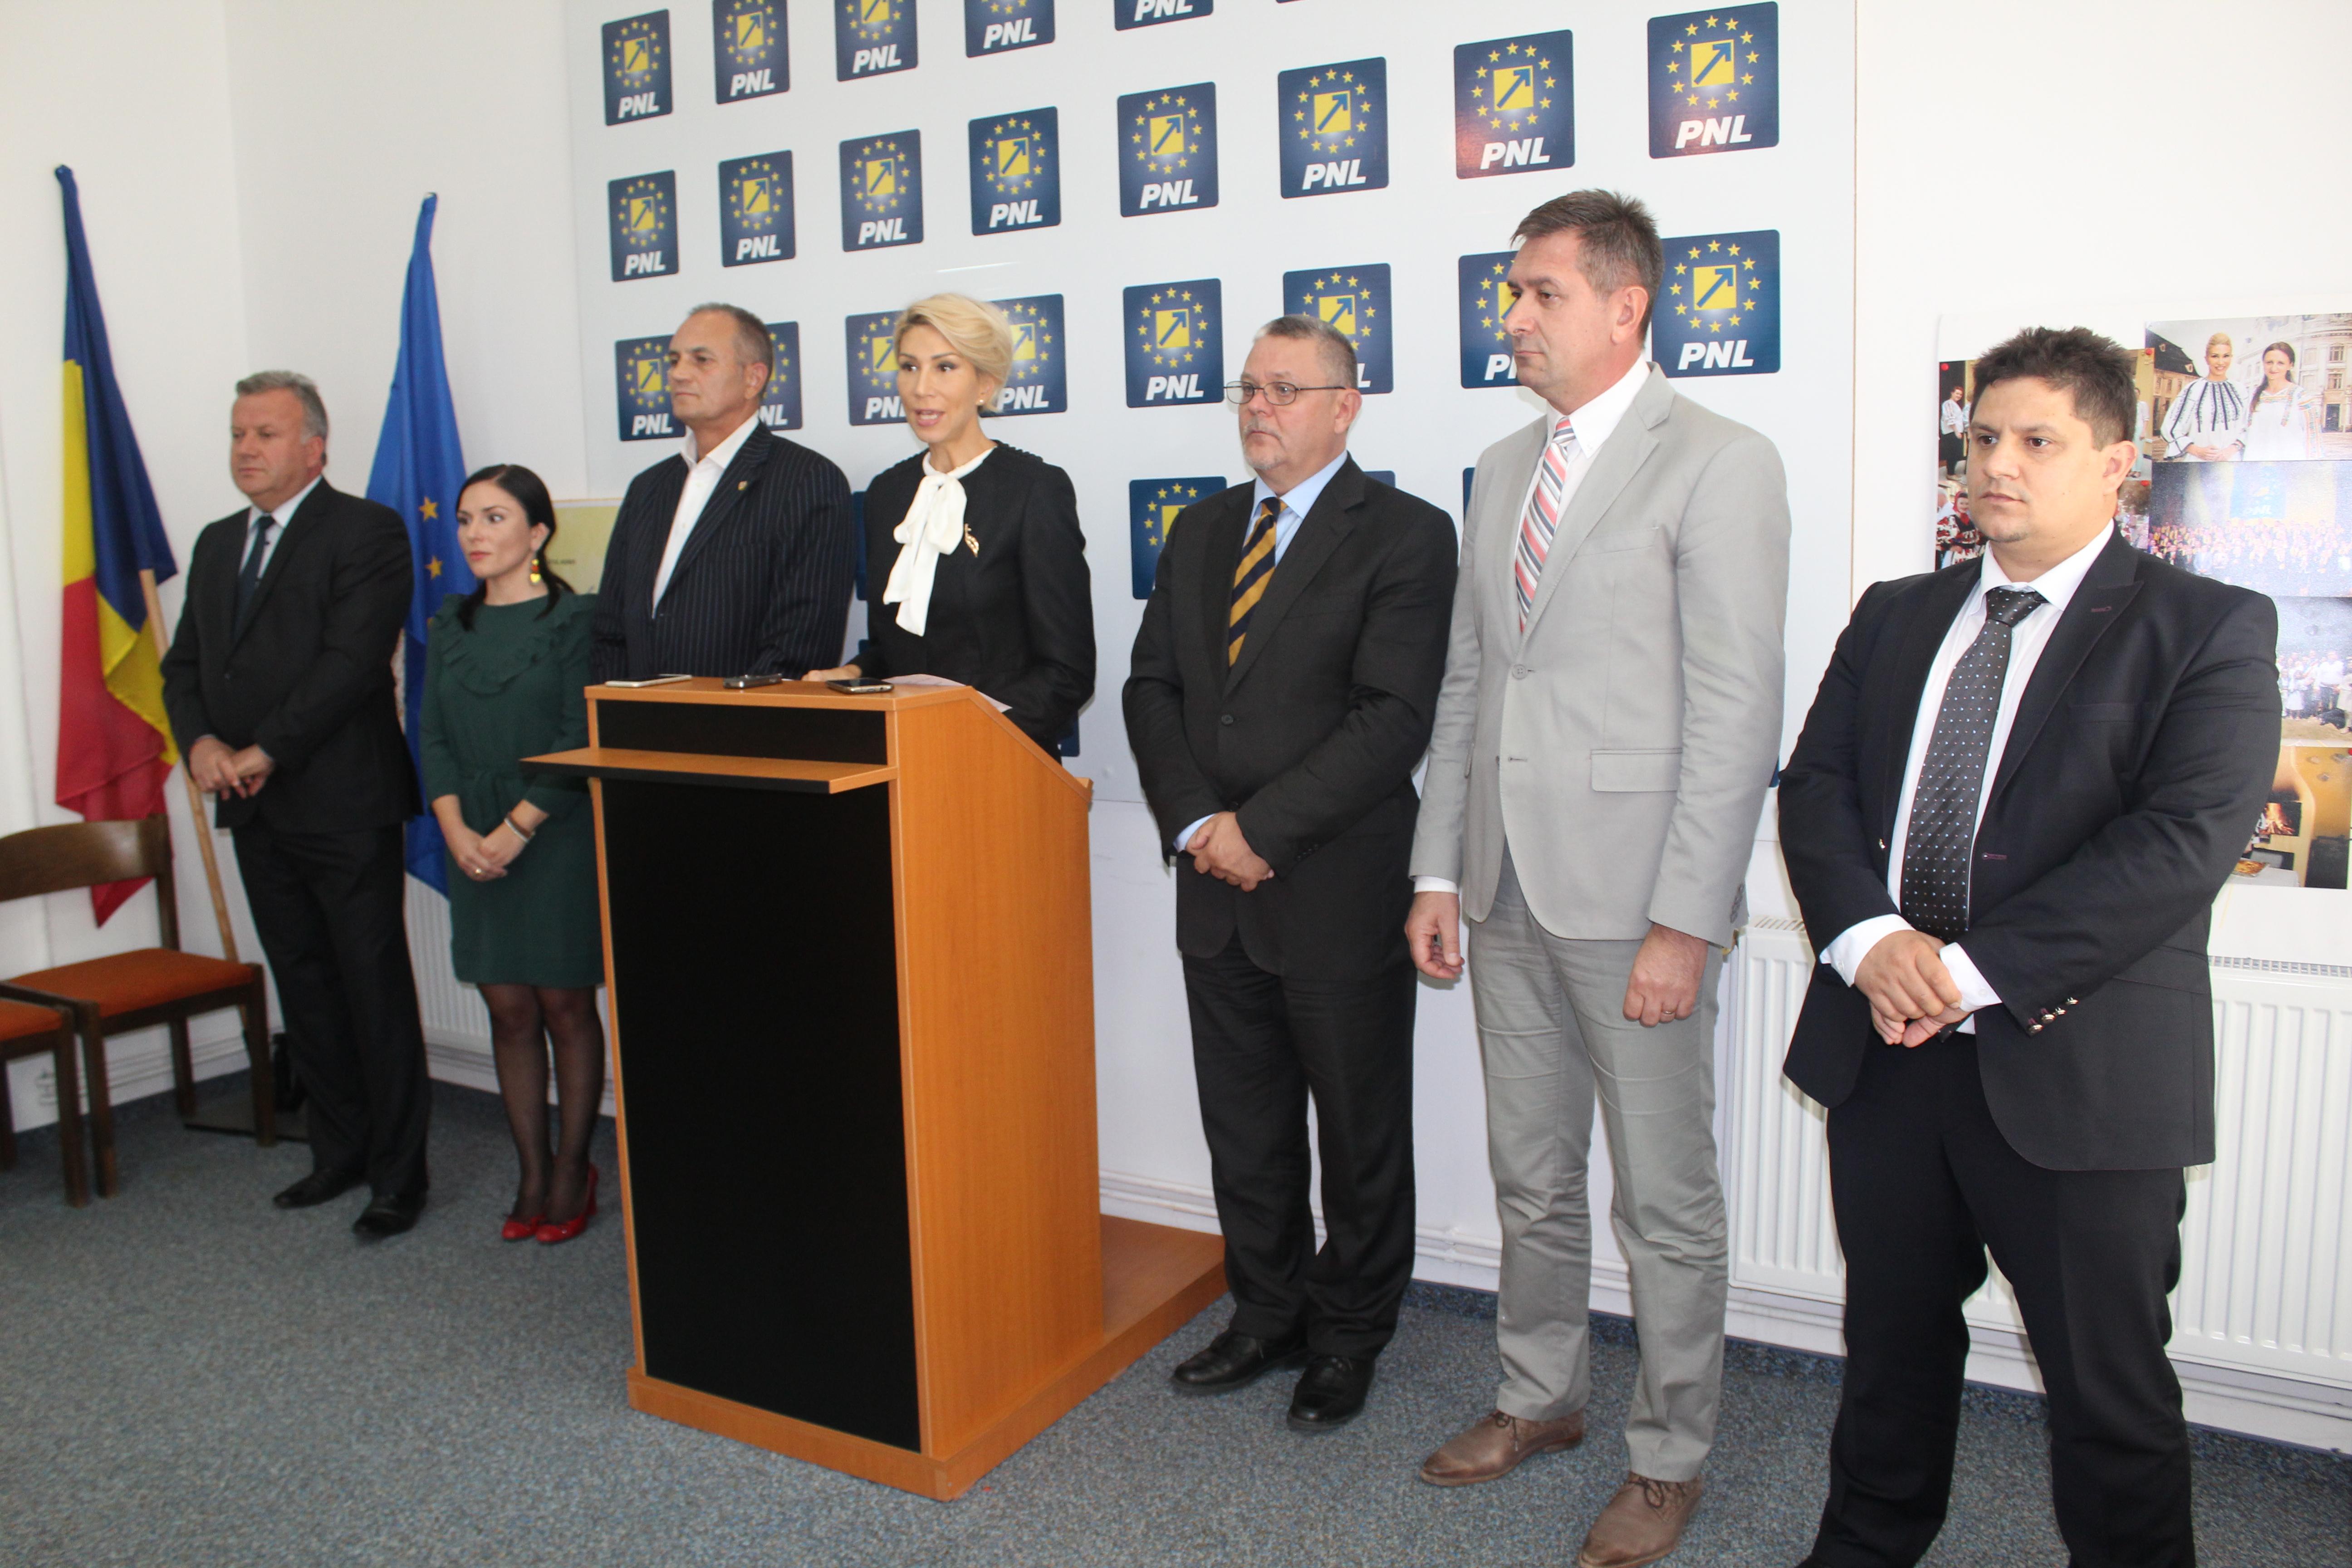 Sibiu ziarul mesagerul inta pnl sibiu doi senatori for Lista senatori